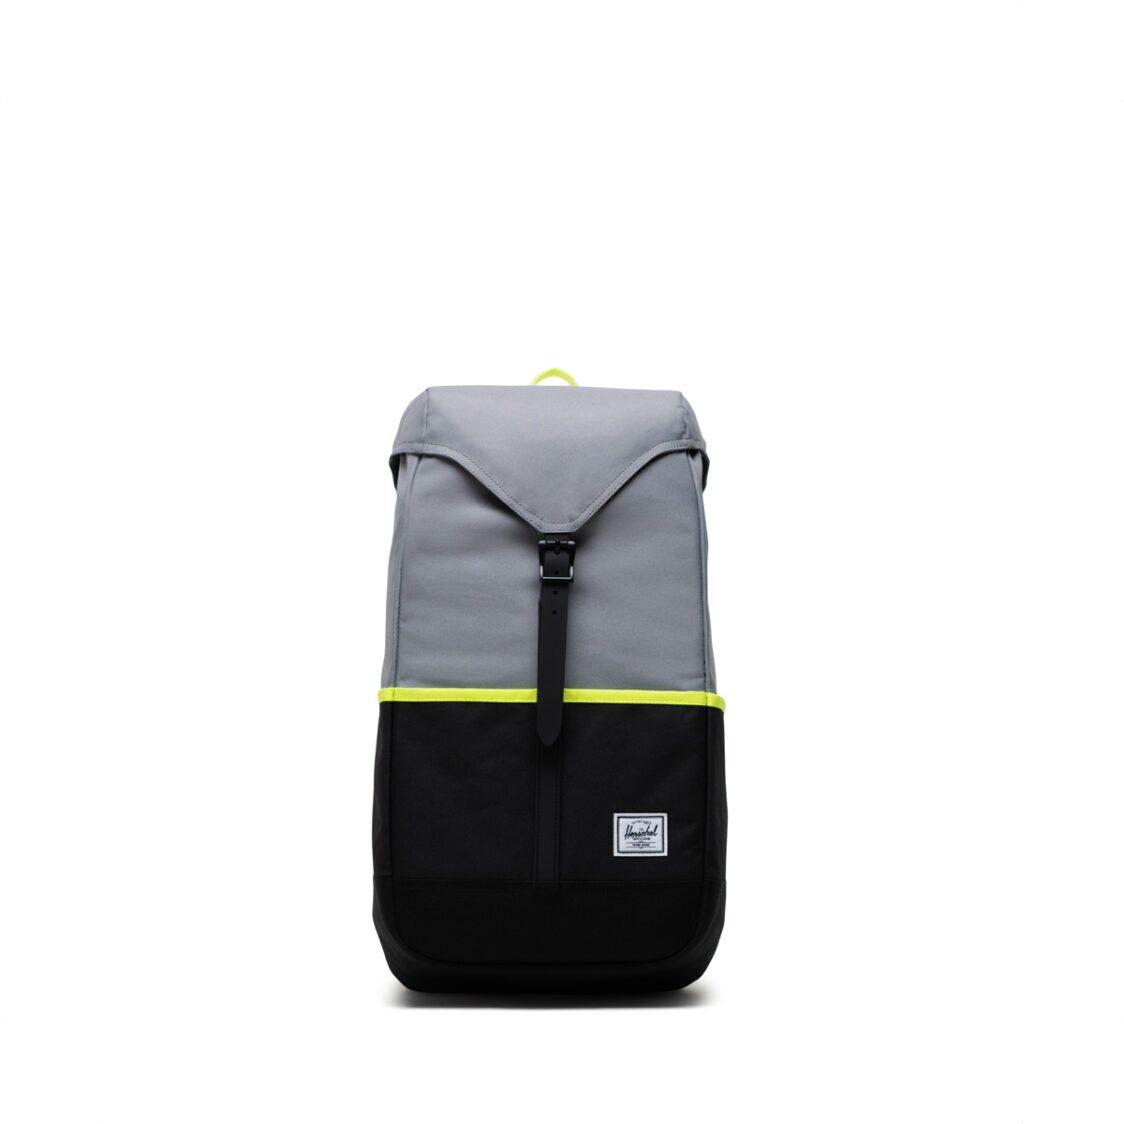 Herschel Thompson Pro GreyBlackSafety Yellow Backpack 11041-04942-OS